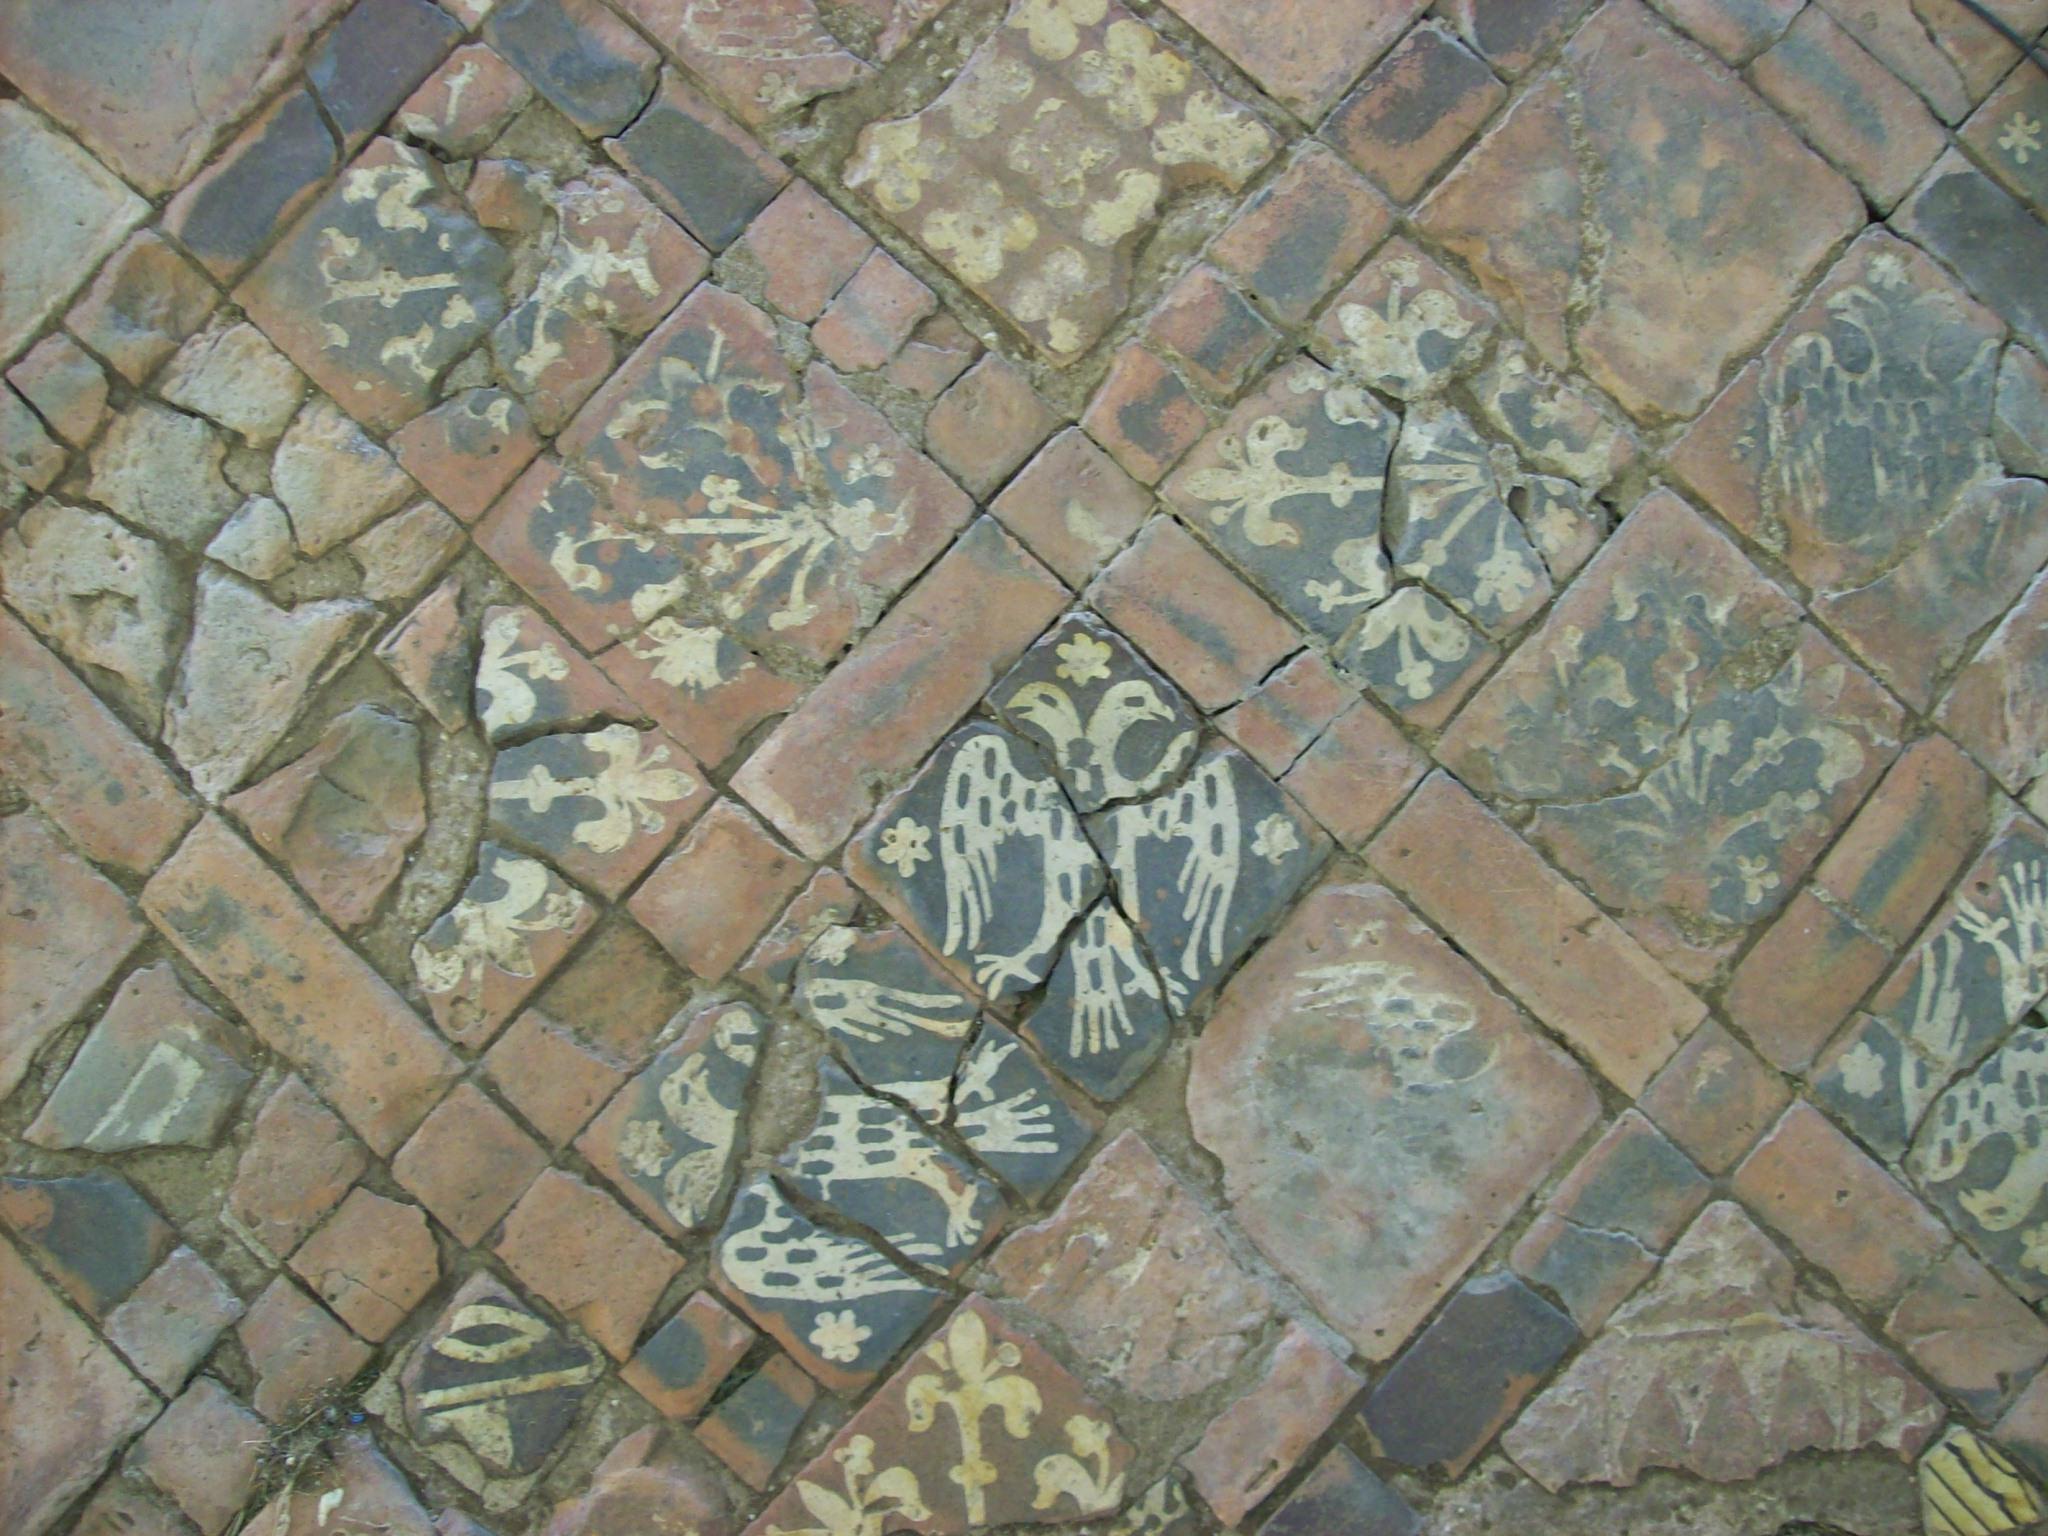 Castle Stone Floor : File medieval floor tiles cleeve abbey g wikimedia